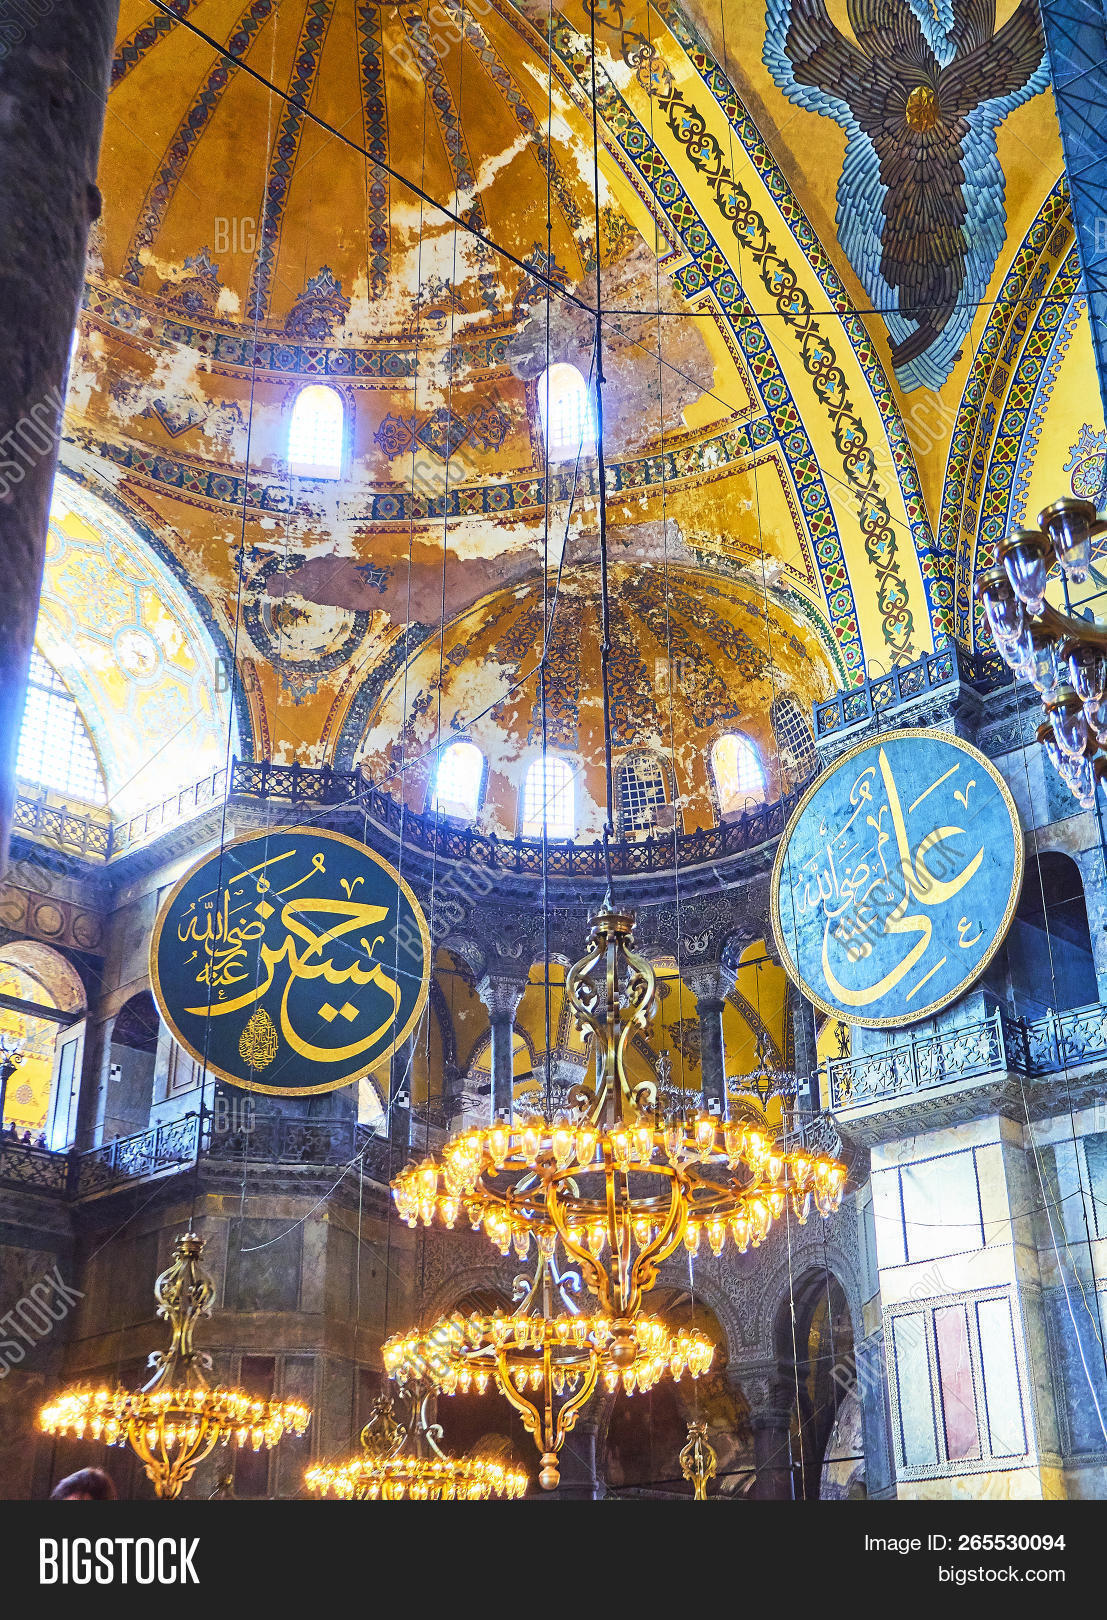 Istanbul, Turkey - Image & Photo (Free Trial) | Bigstock